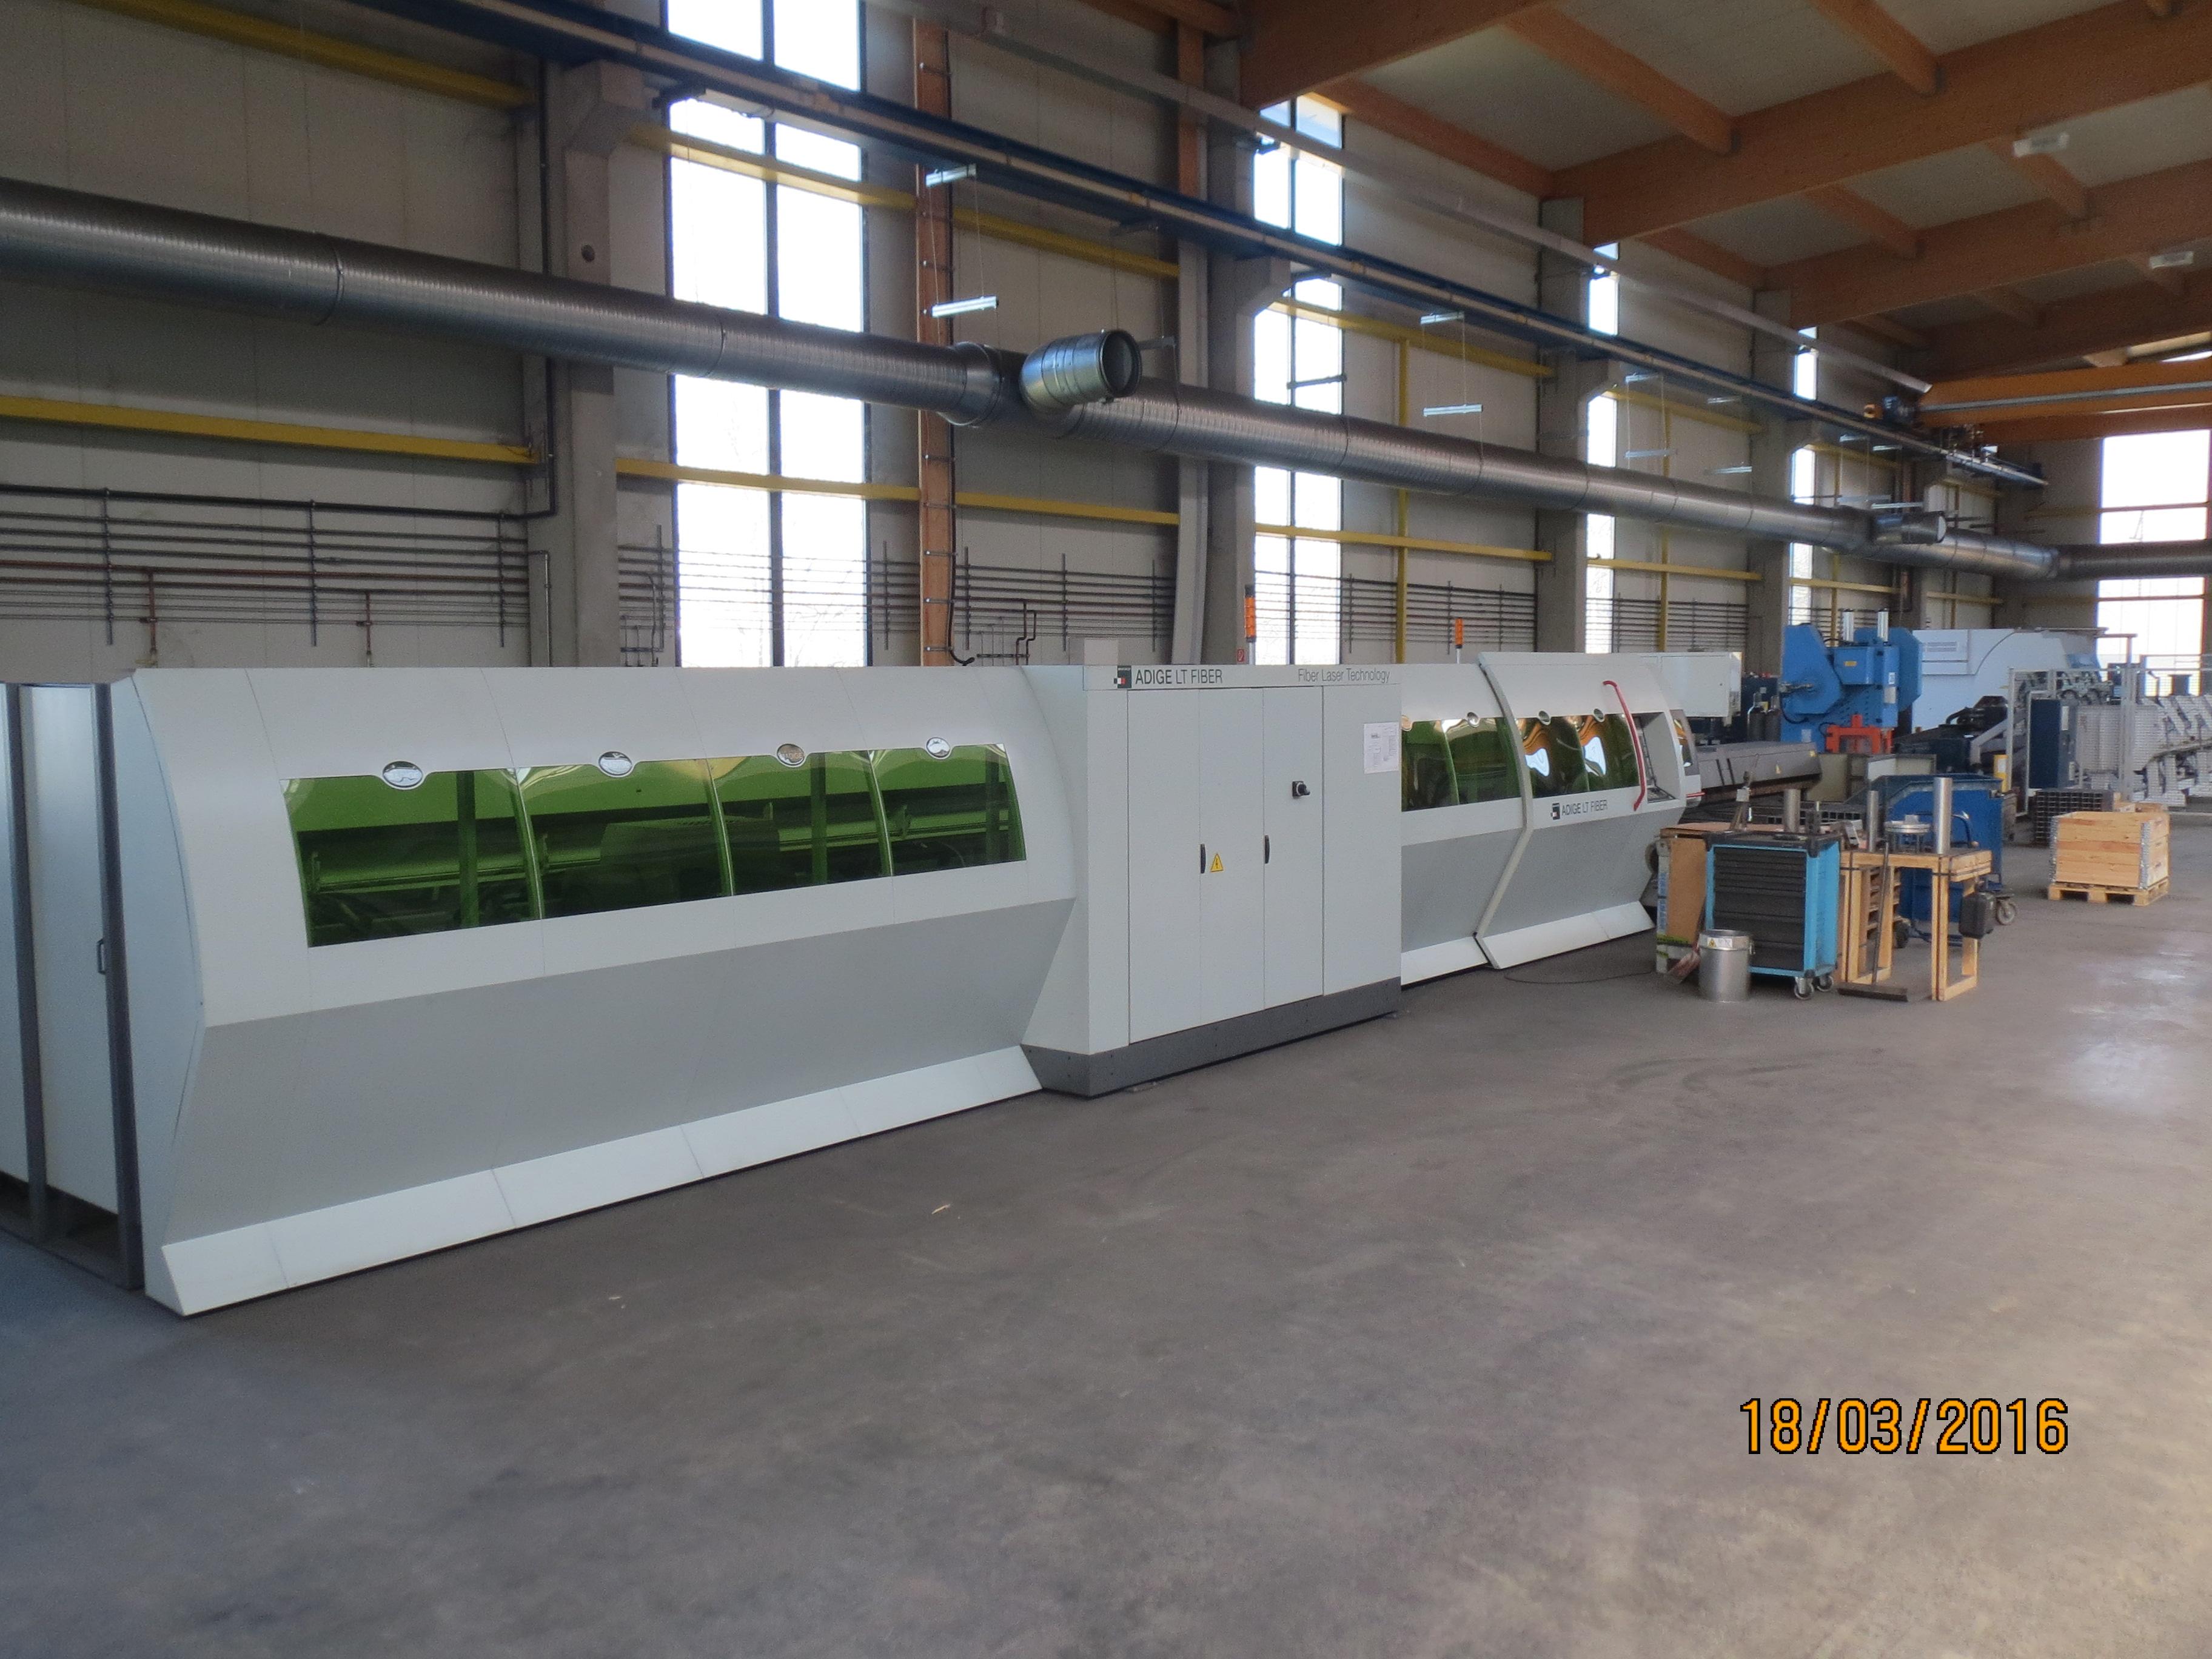 Blm Adige Lt Fiber Tube Laser Cutting Machine Exapro